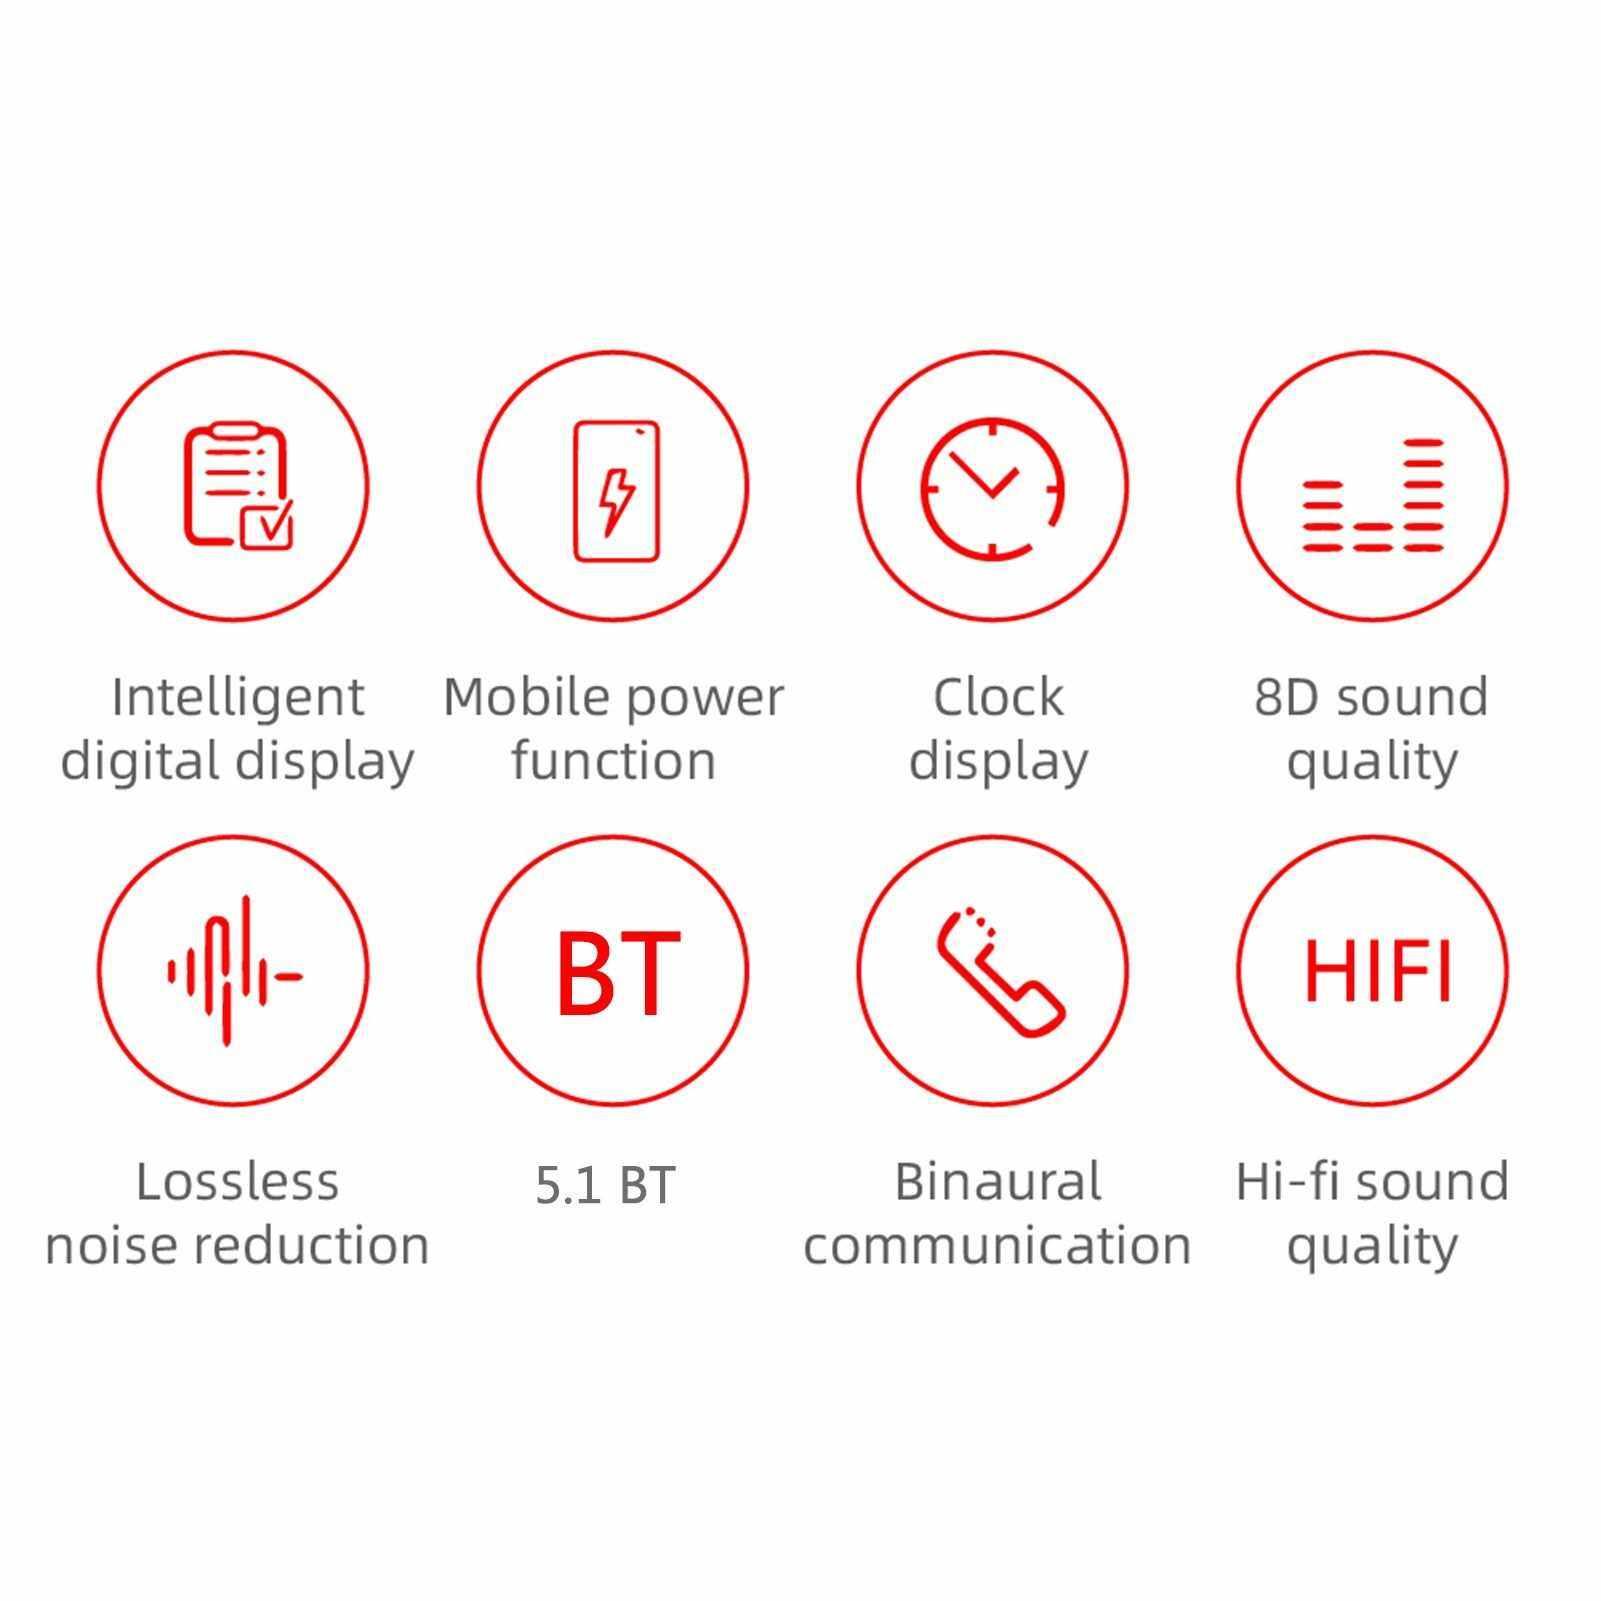 Best Selling G6 (D18) BT5.1 Wireless Headphones Auto Pairing Power Clock Display 8D Sound Effect Noise Reduction IPX4 Waterproof (Standard)